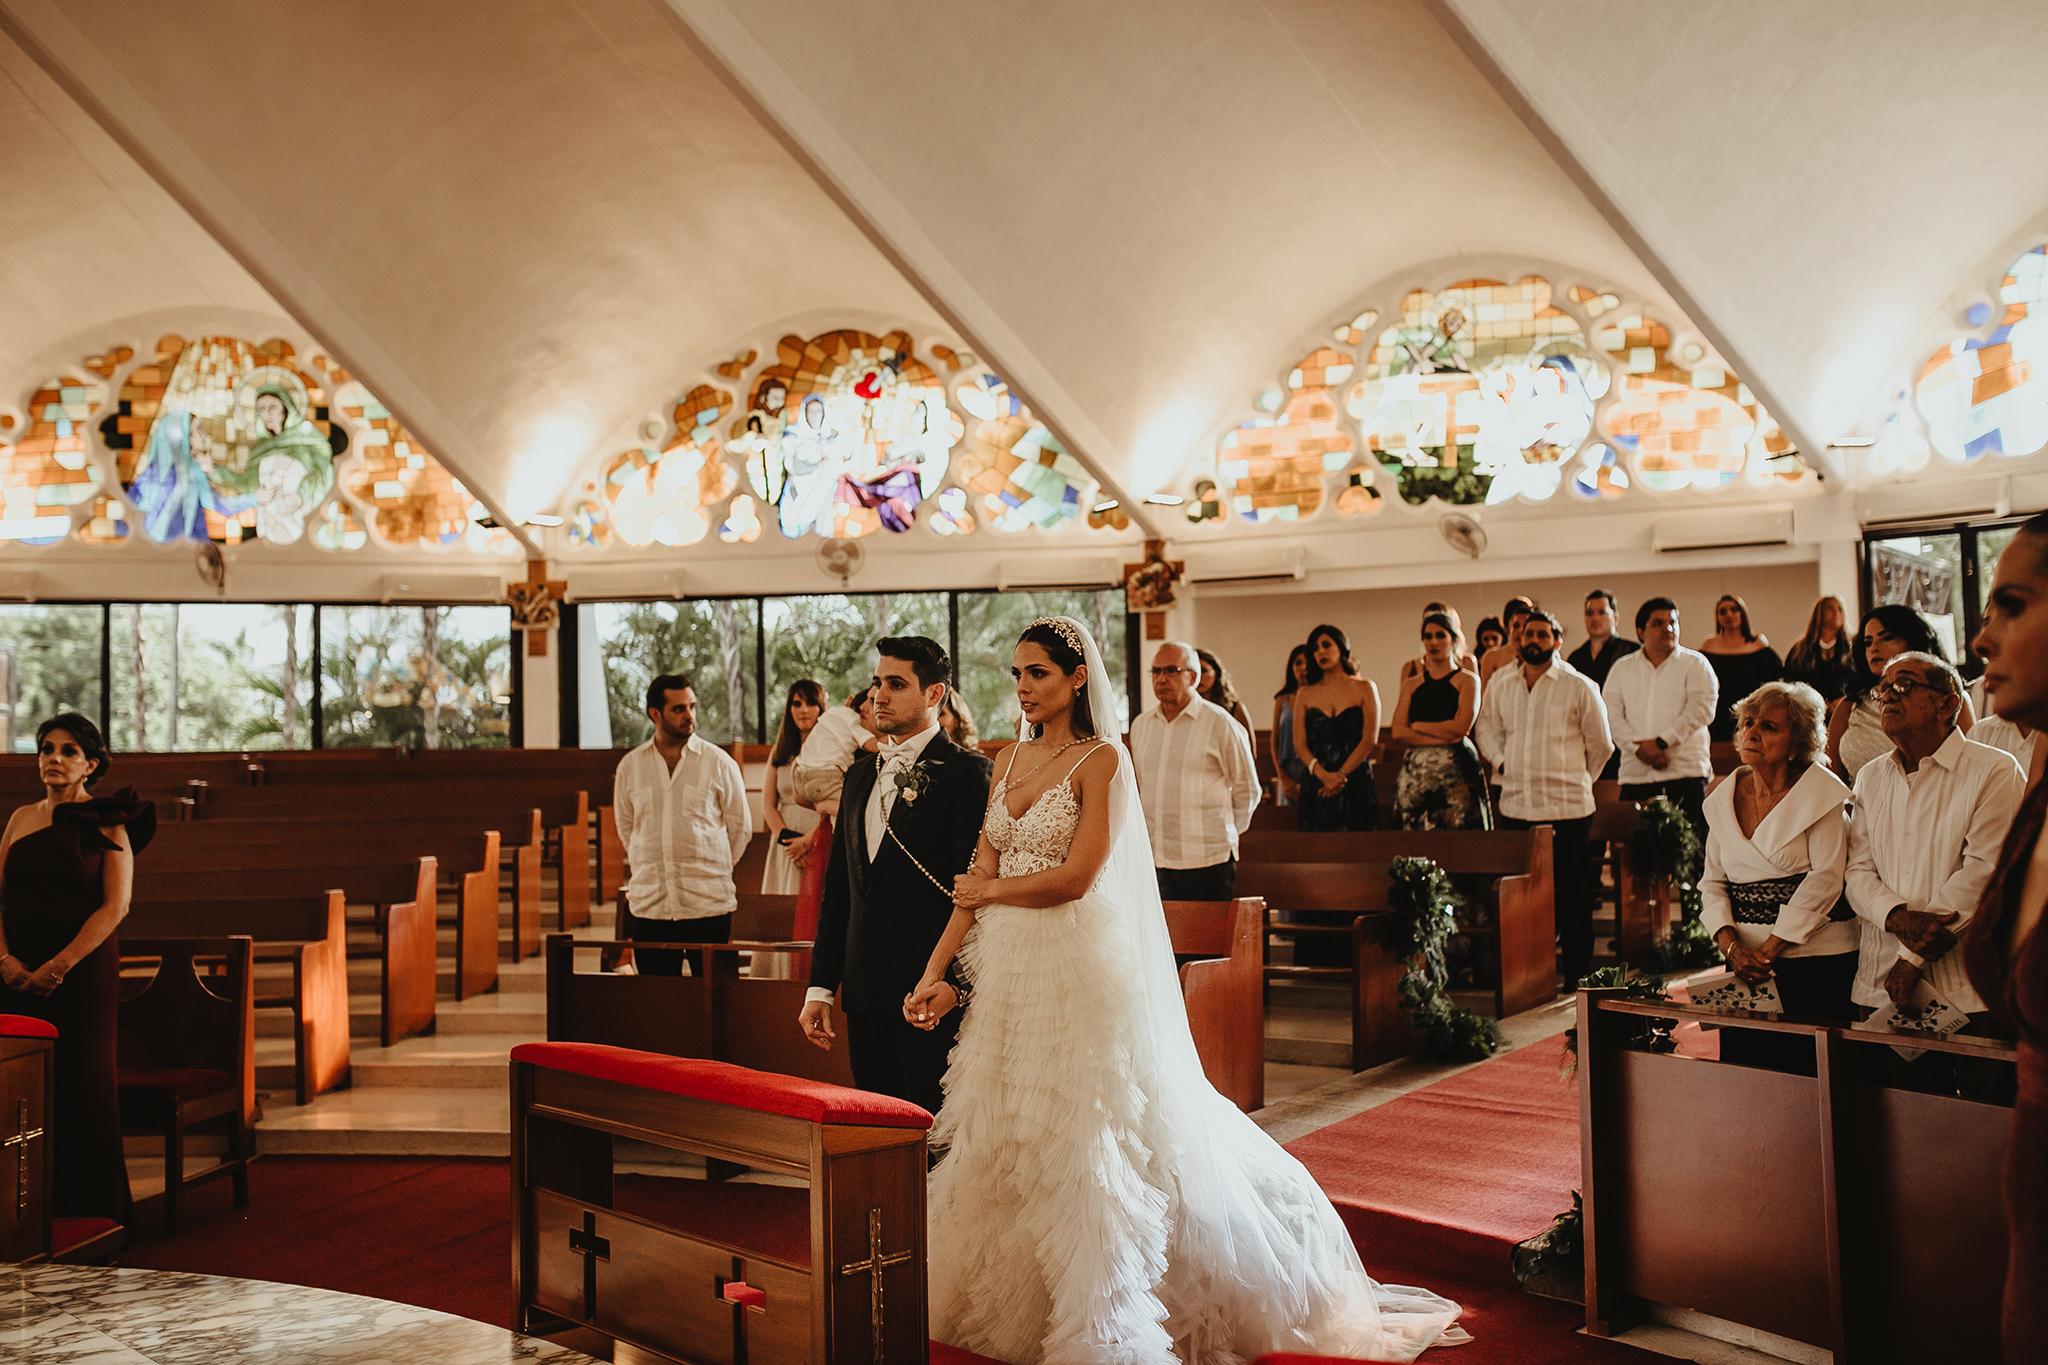 0717R&F__WeddingDestination_Weddingmerida_BodaMexico_FotografoDeBodas_FabrizioSimoneenFotografo.jpg